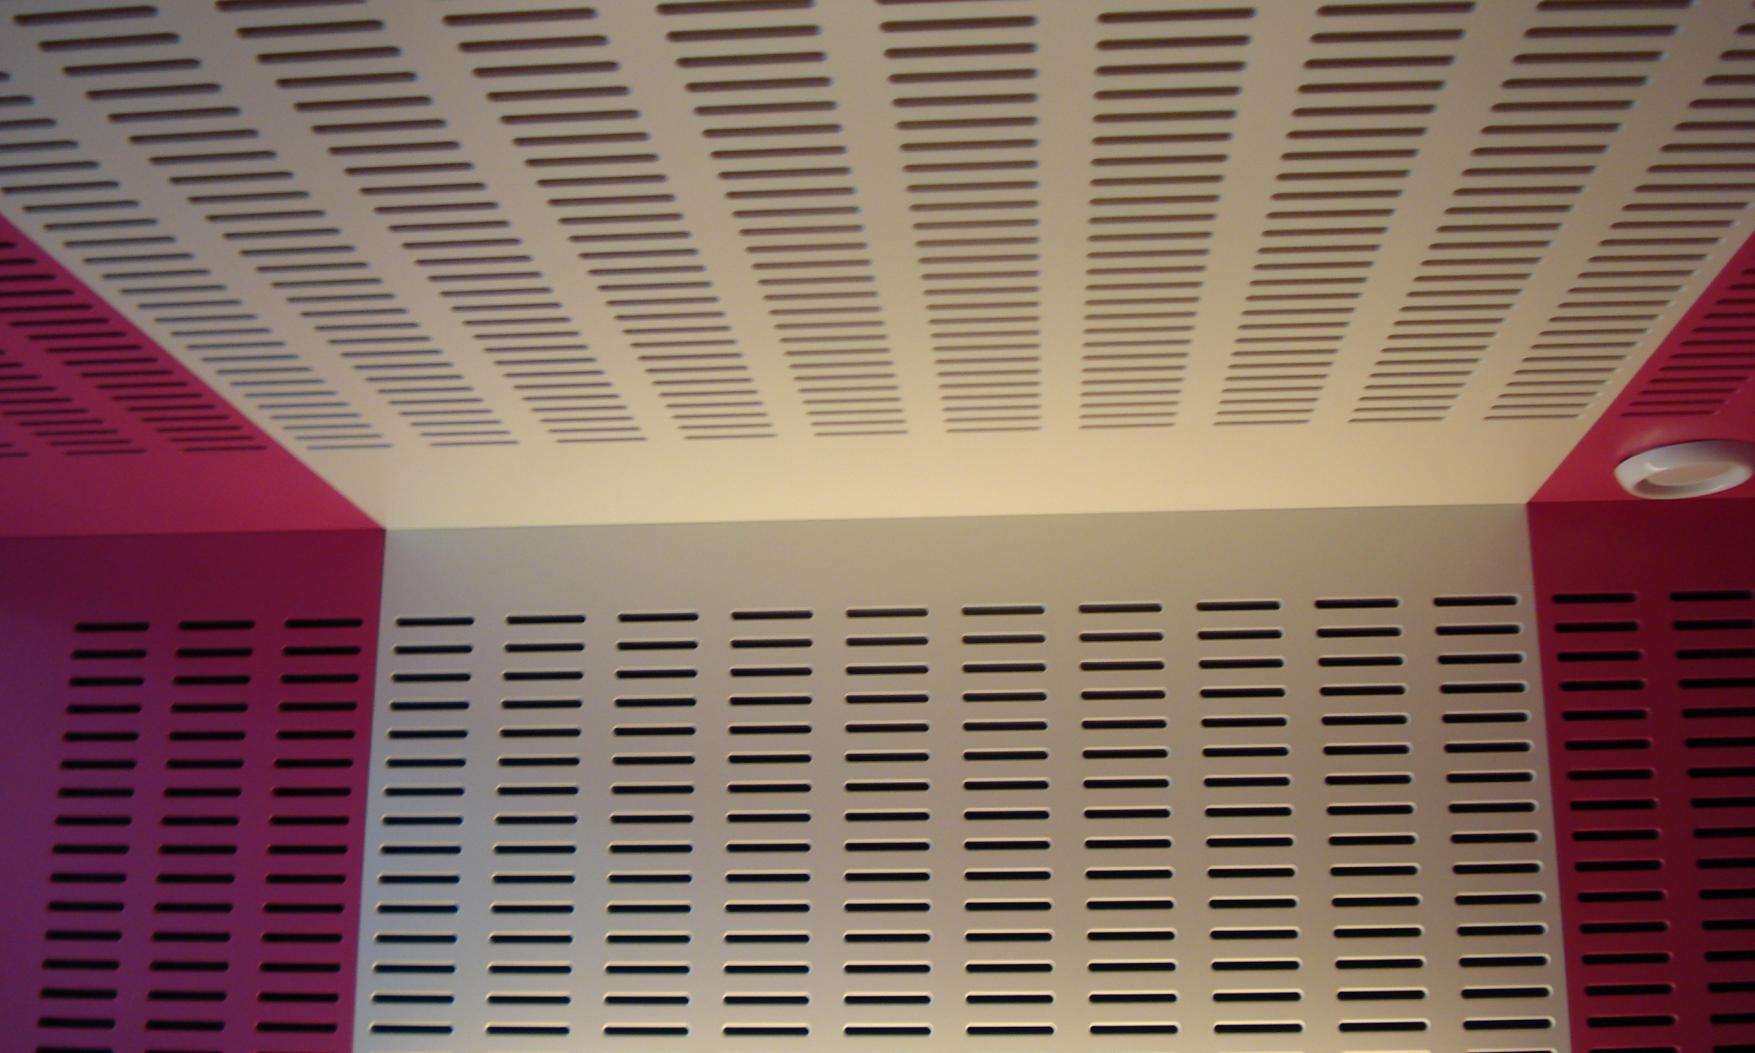 Harryvan Interierbouw | akoestische plafond en wandbekleding (Stenden Hogeschool Meppel)